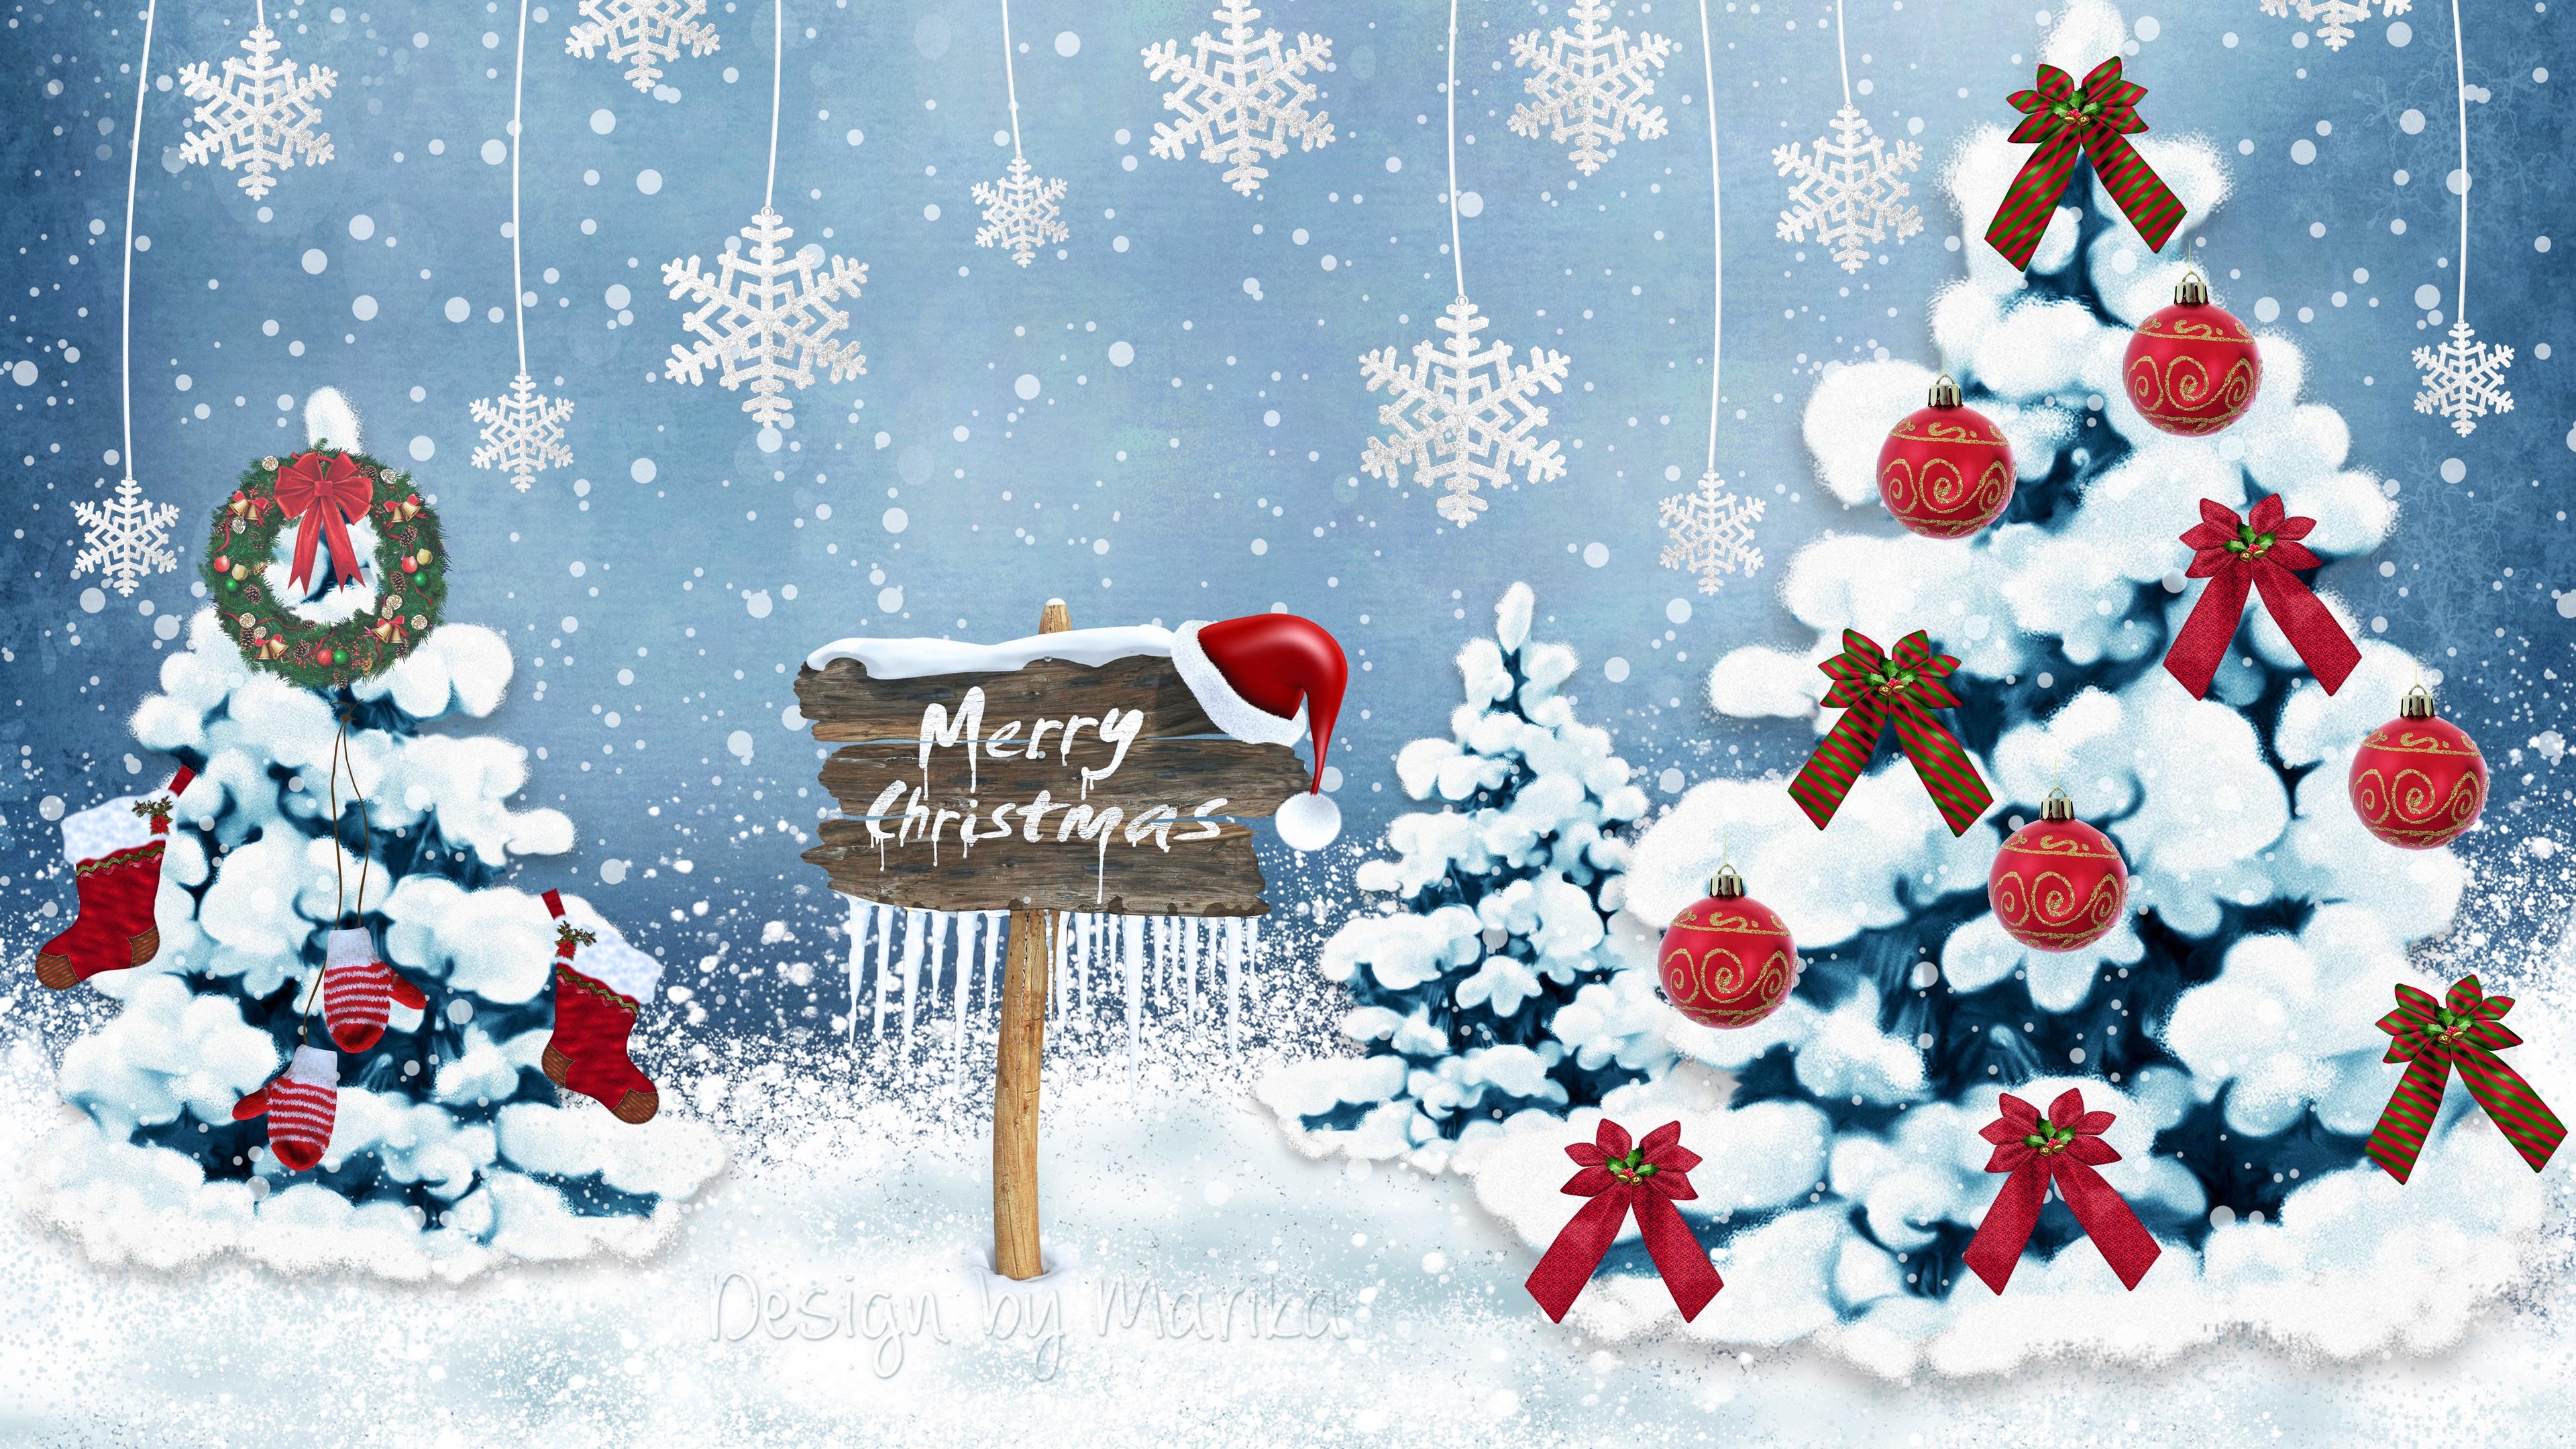 new year christmas card christmas trees snowflakes ornaments 4k 1538345406 - new year, christmas, card, christmas trees, snowflakes, ornaments 4k - new year, Christmas, Card